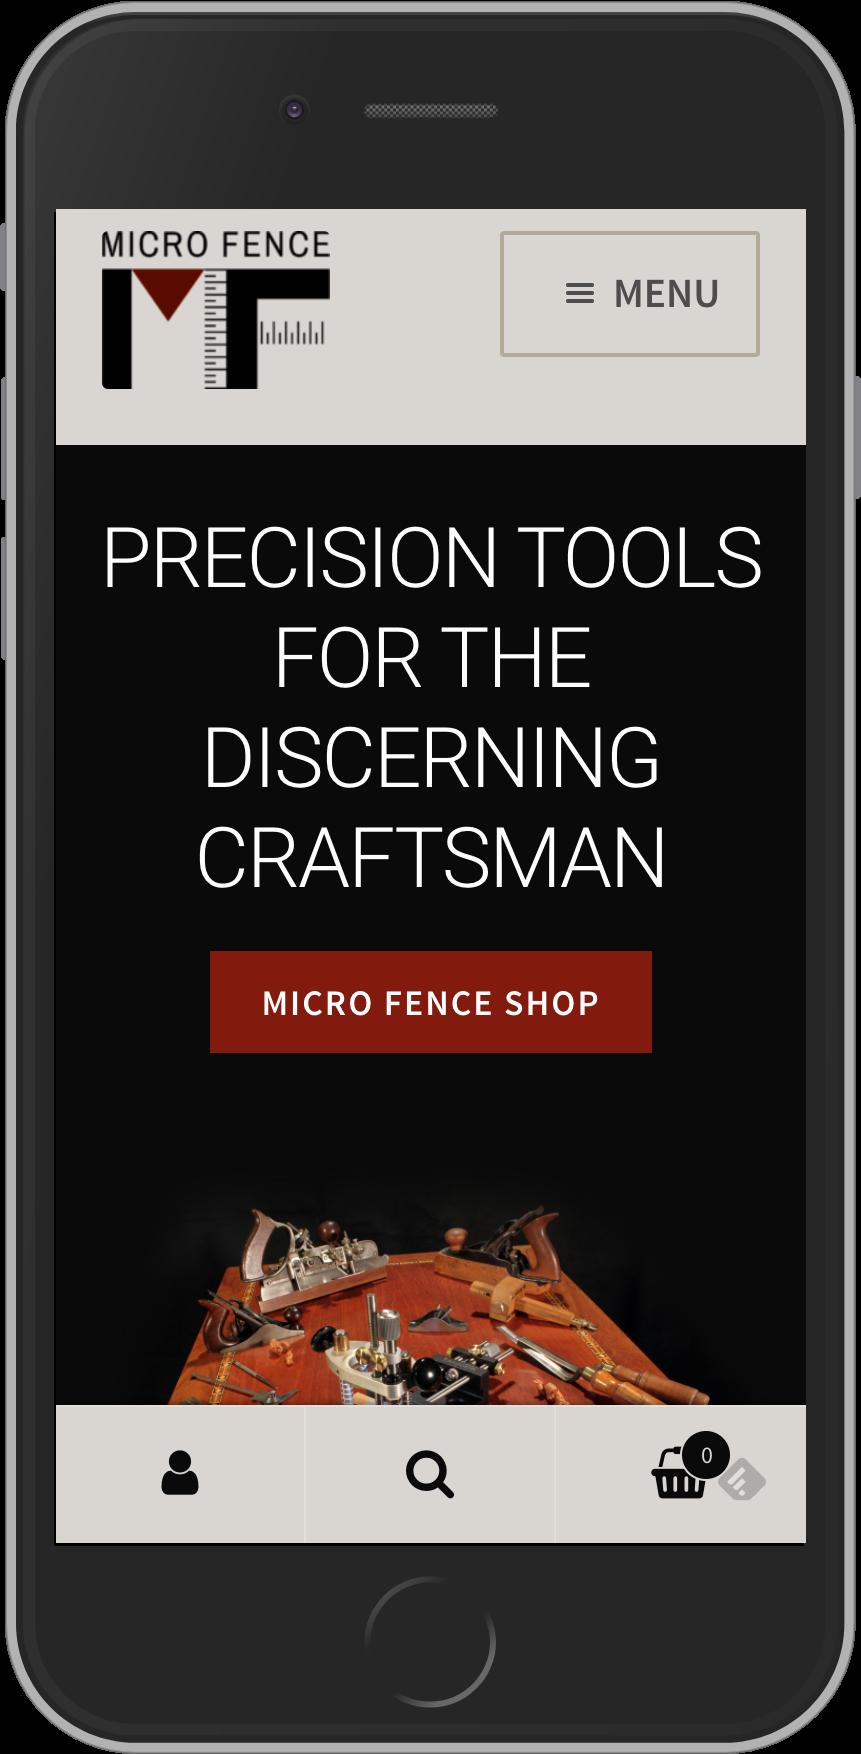 microfence.uwldev.com-(iPhone 6)